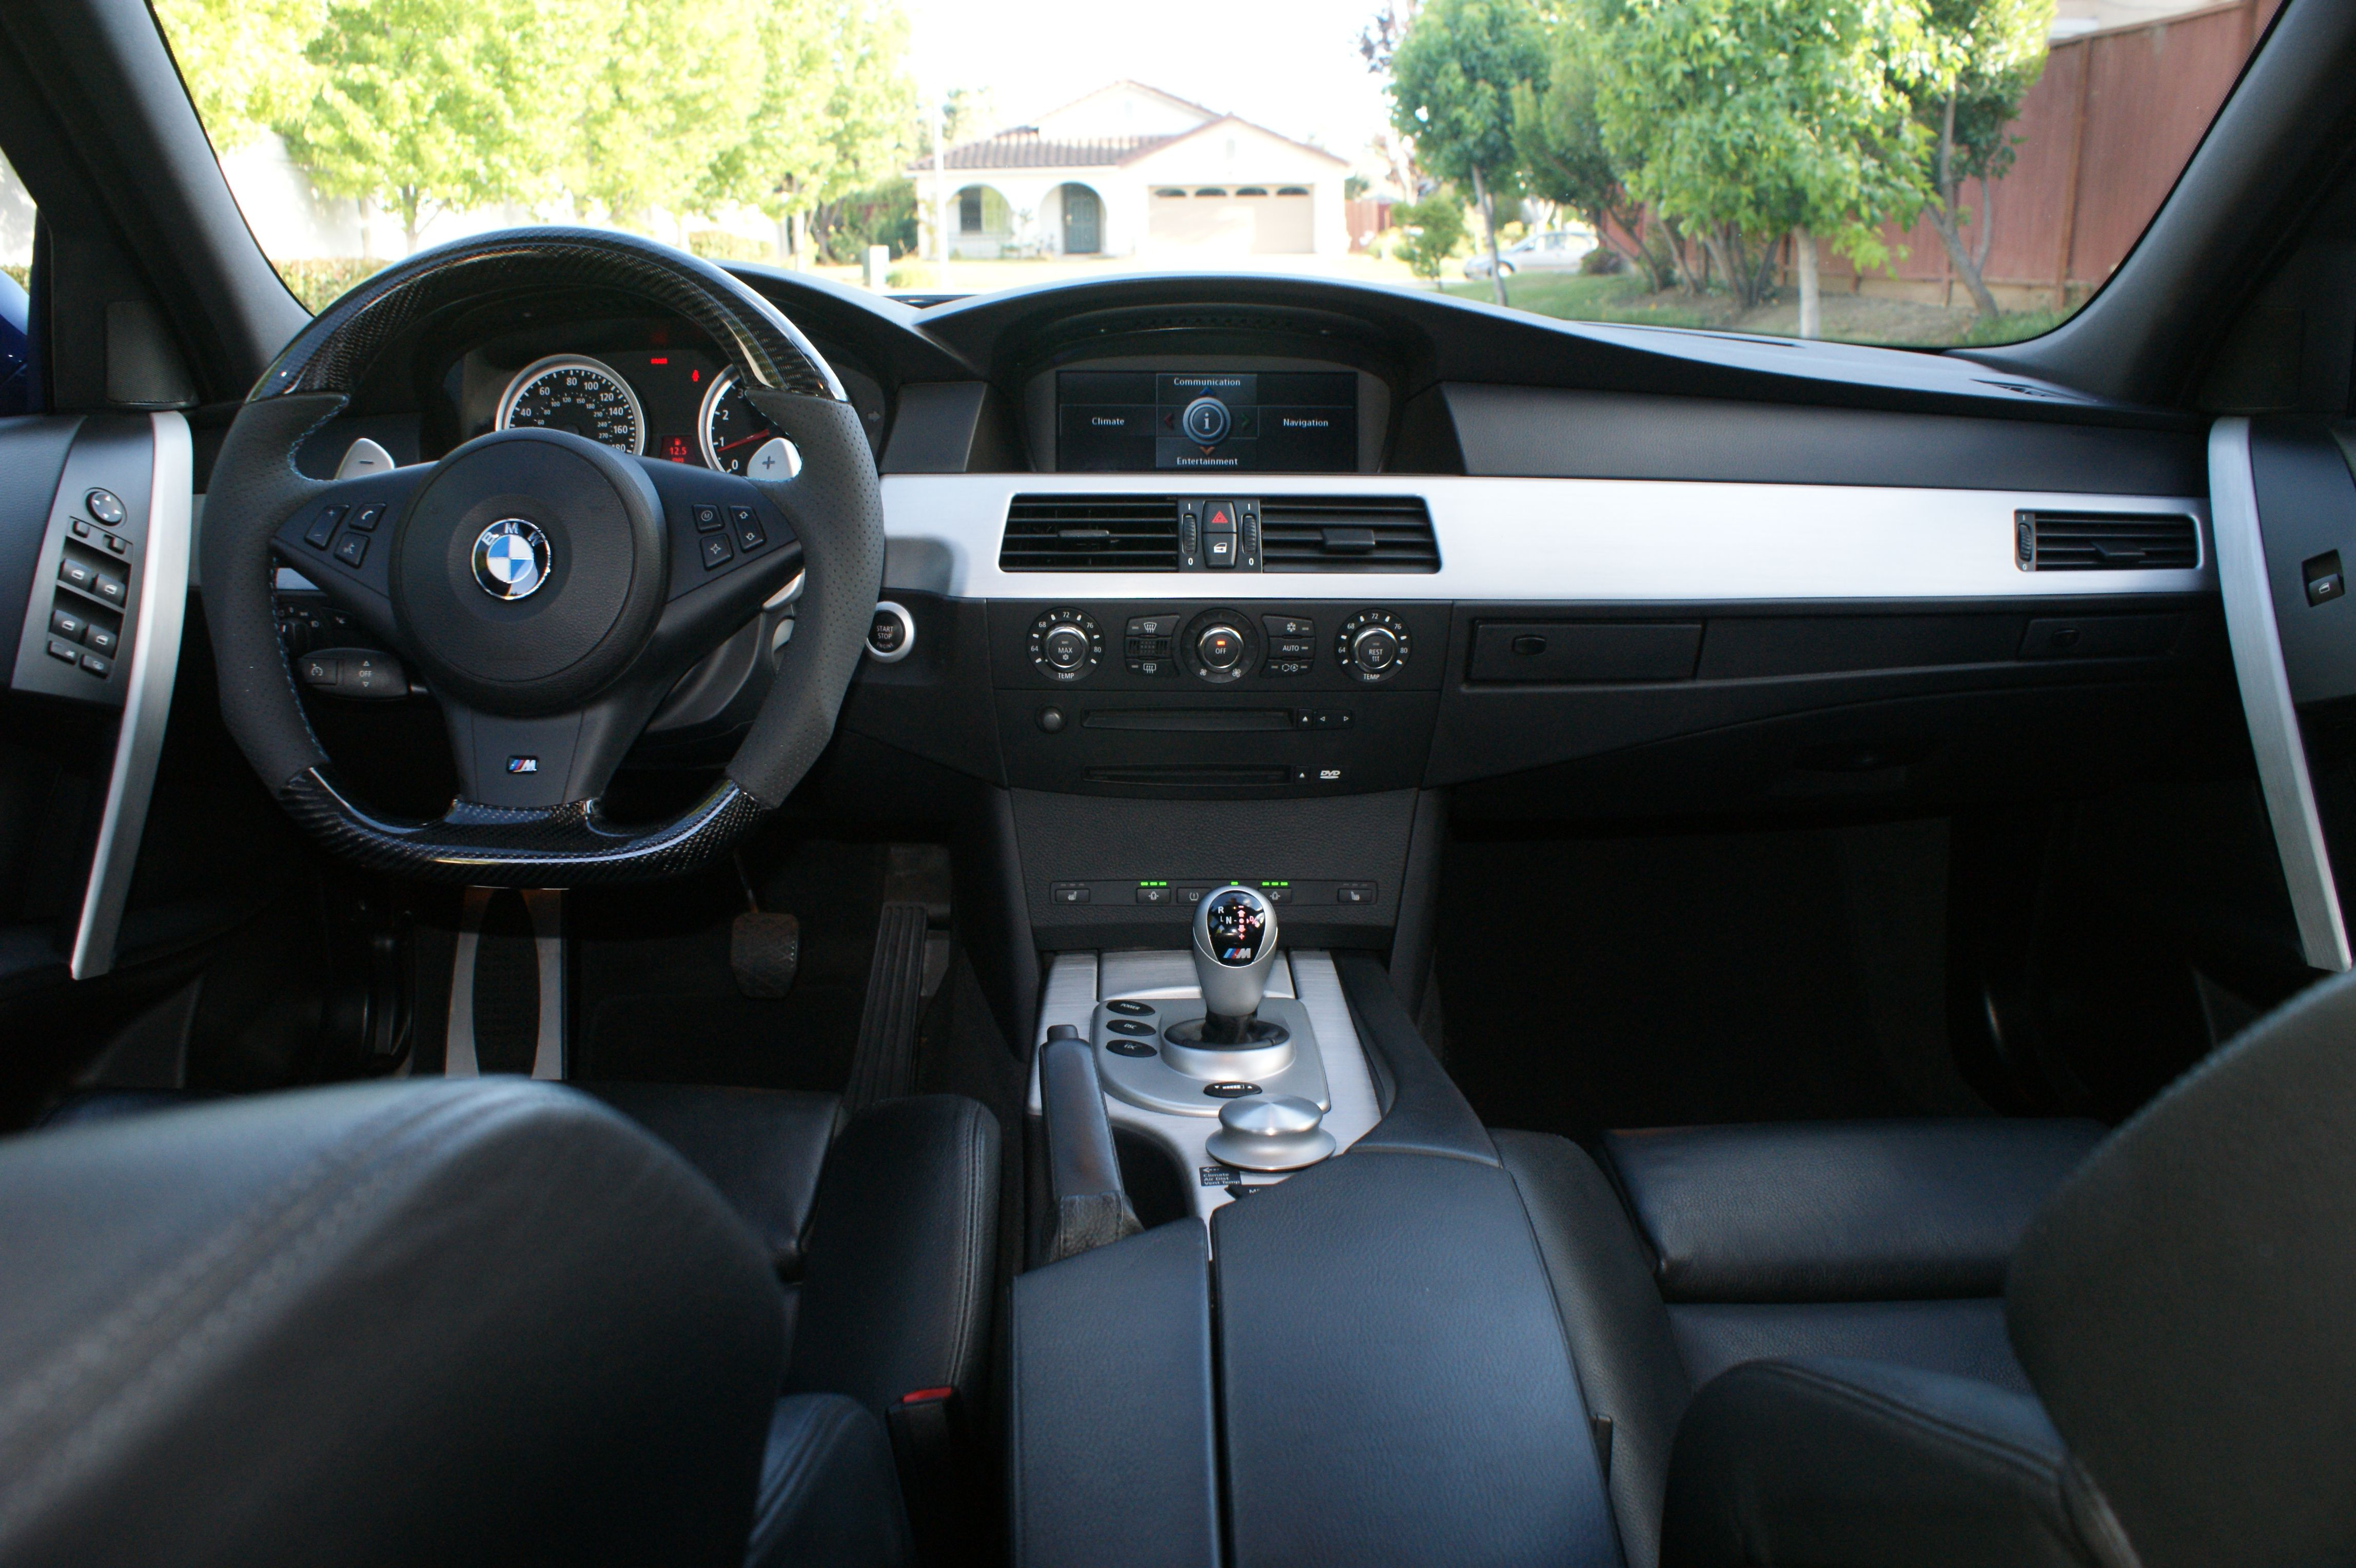 BMW E60 ///M5 Interior 5 Series (20032010) BMW 5 Series